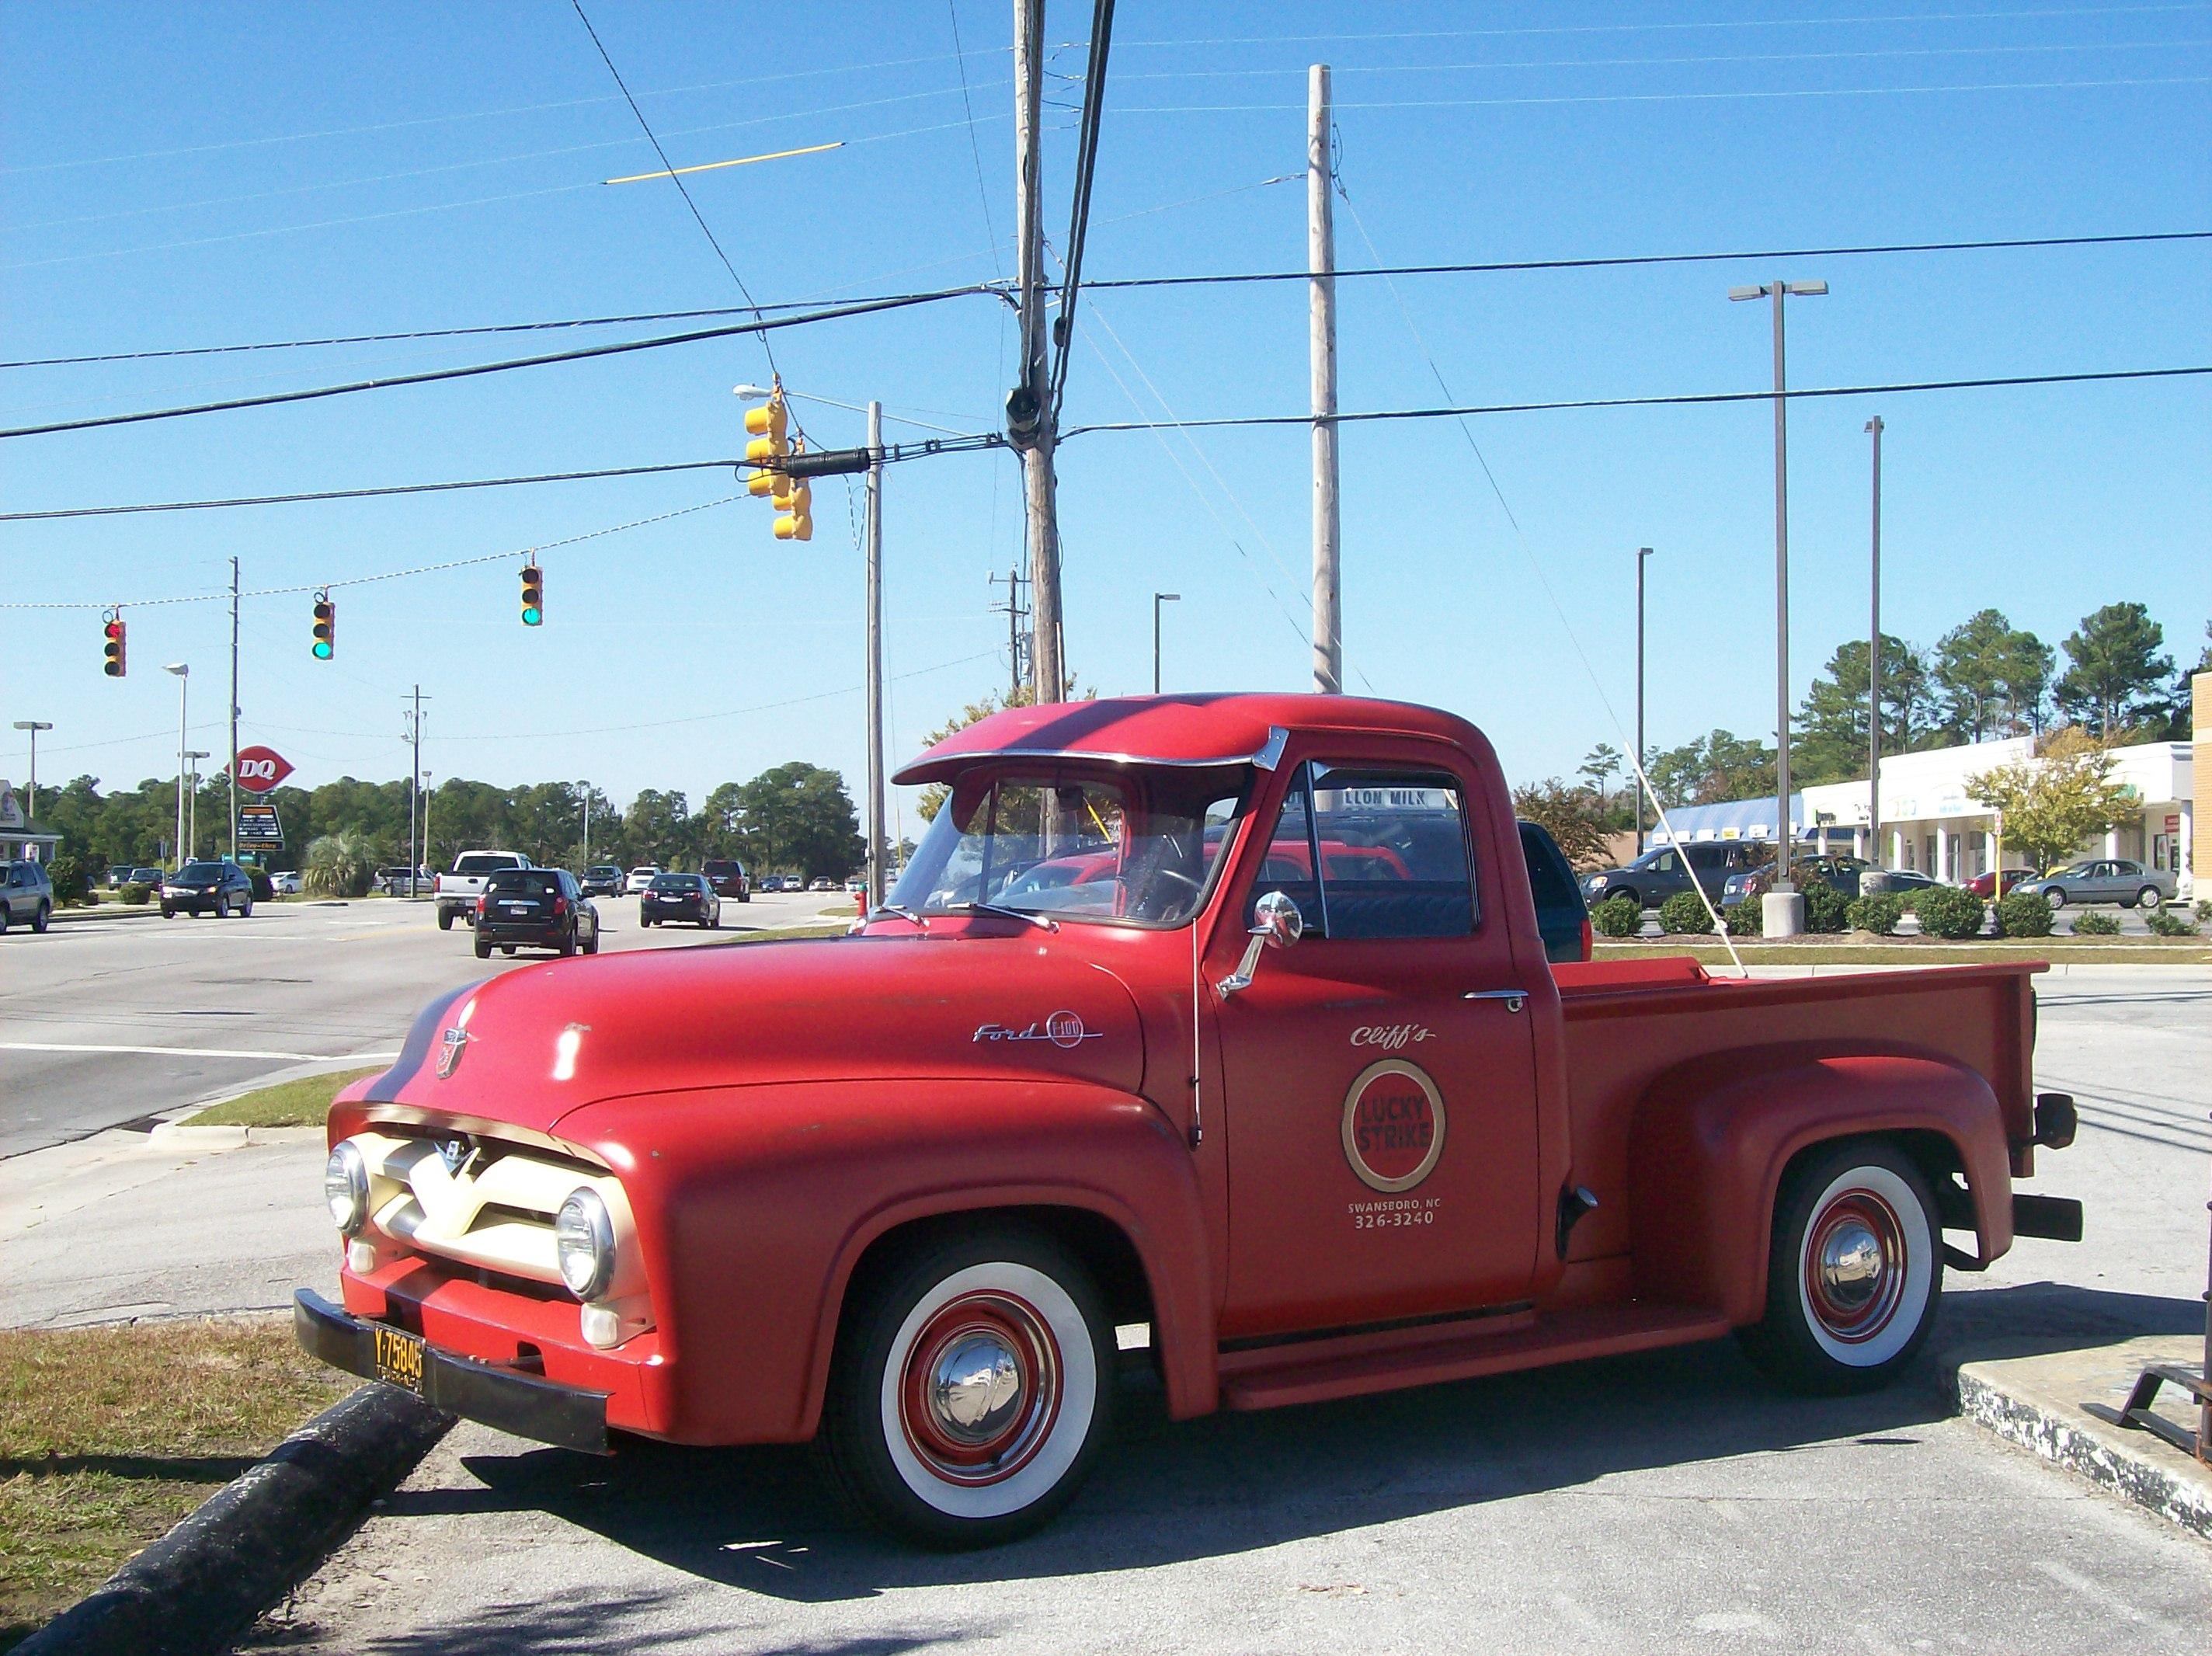 Old Ford Pickup Truck wallpaper   ForWallpapercom 2848x2132